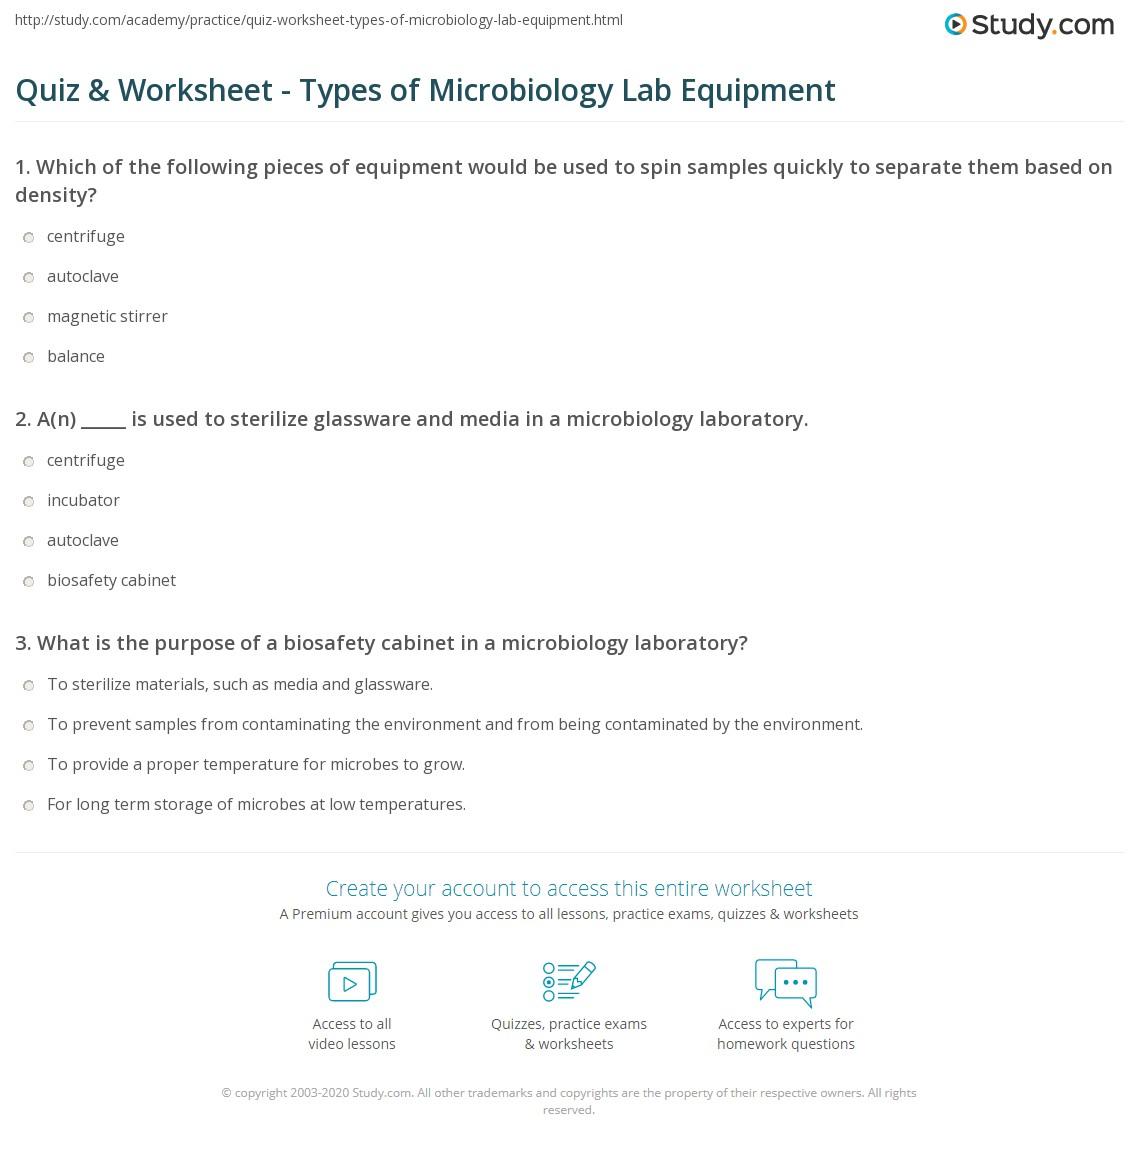 Worksheets Biology Lab Equipment Worksheet quiz worksheet types of microbiology lab equipment study com print common laboratory worksheet